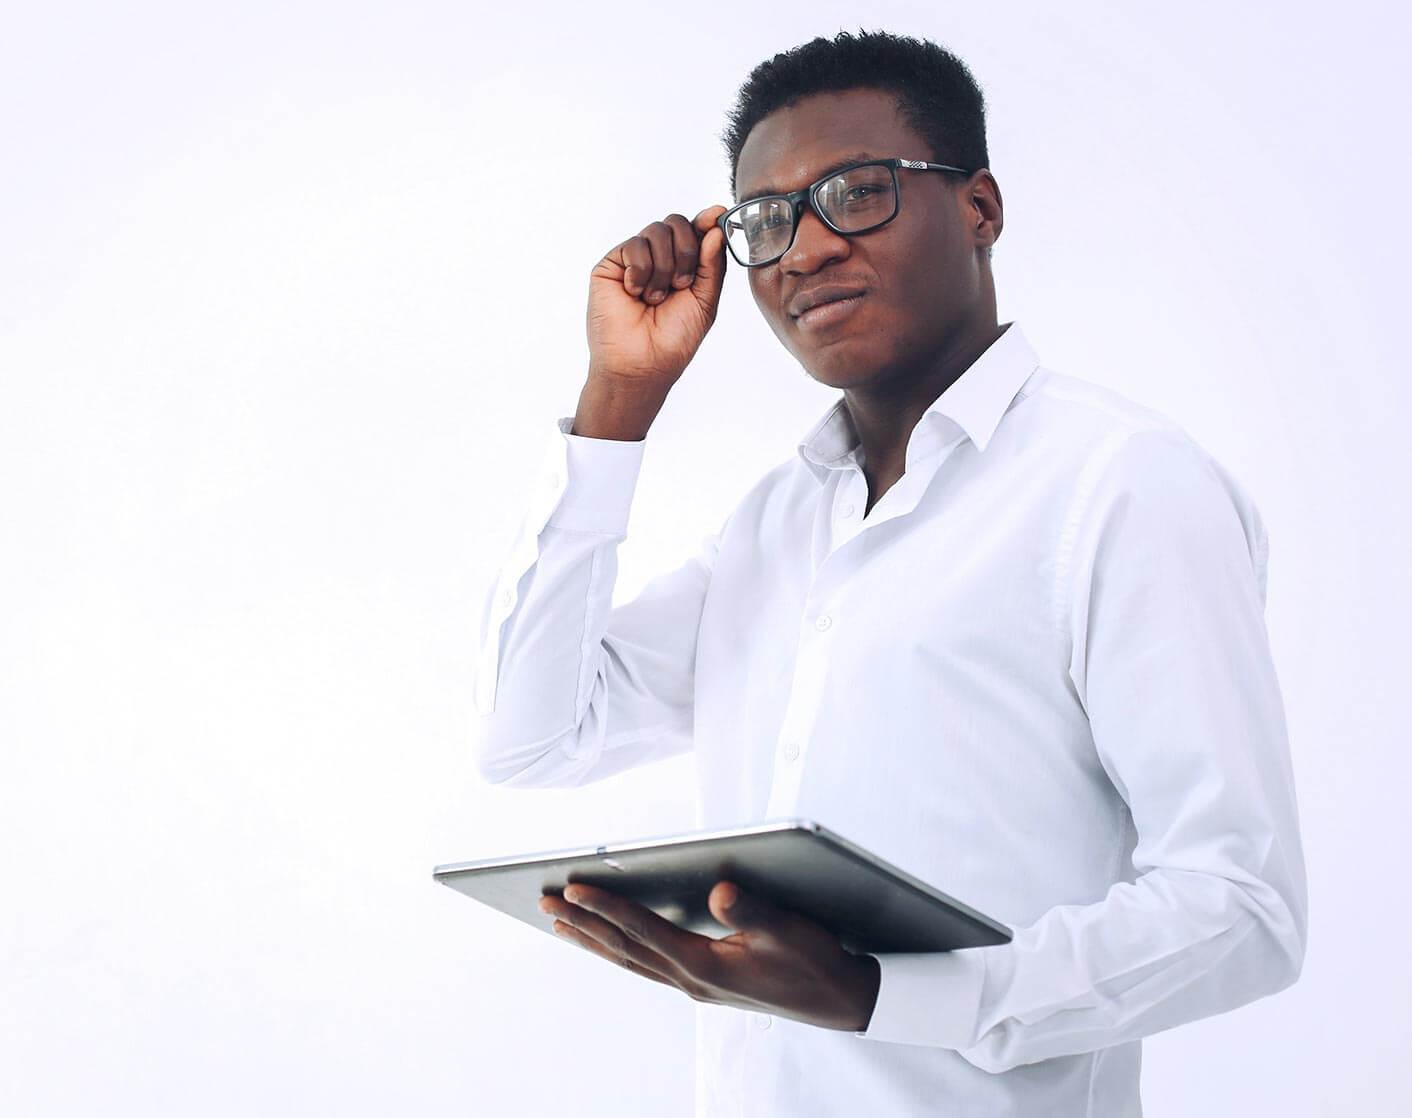 black man in white shirt adjusting glasses while holding tablet